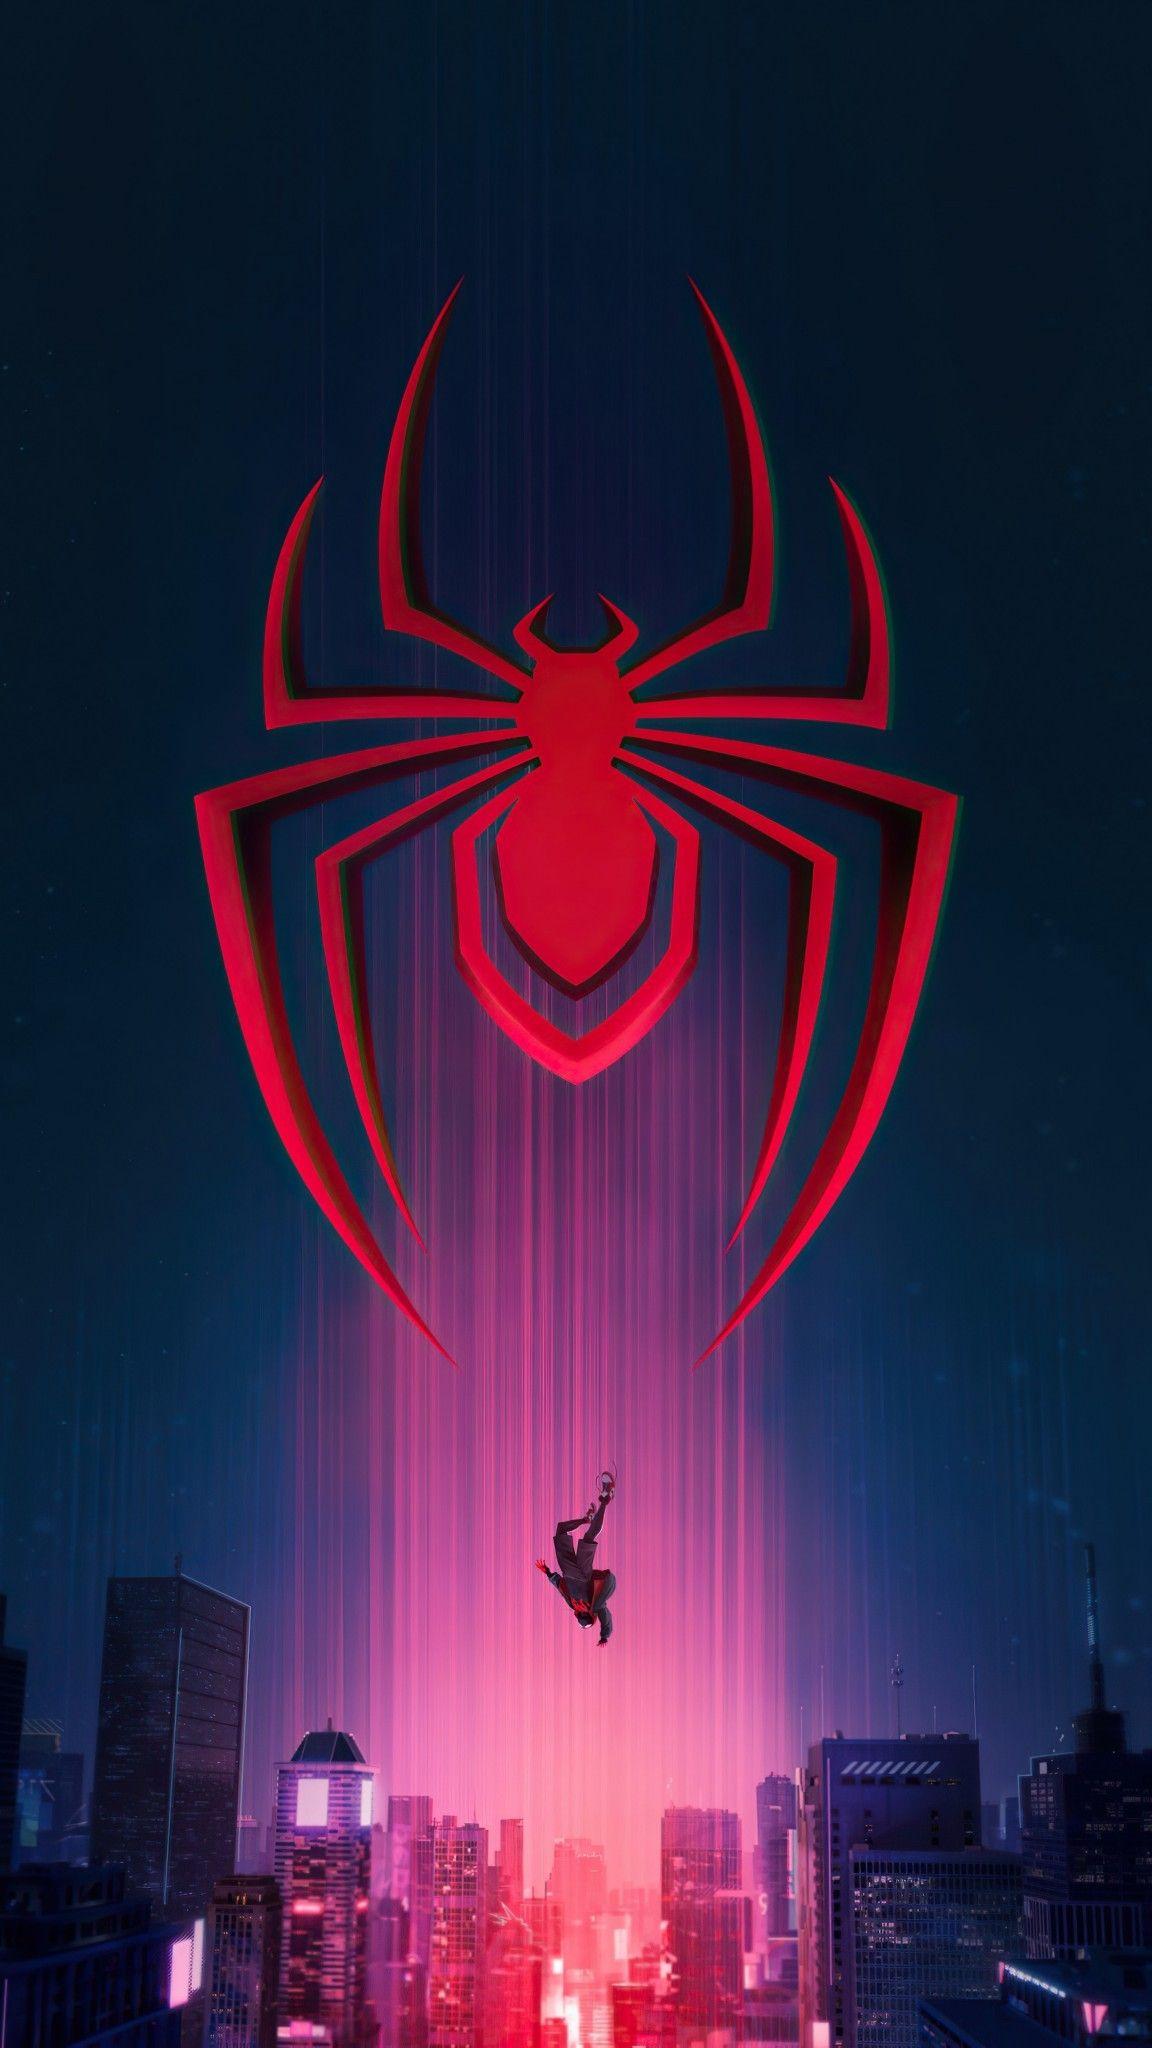 Miles Morales Spider Man Miles Spiderman Miles Morales Spiderman Spiderman Art